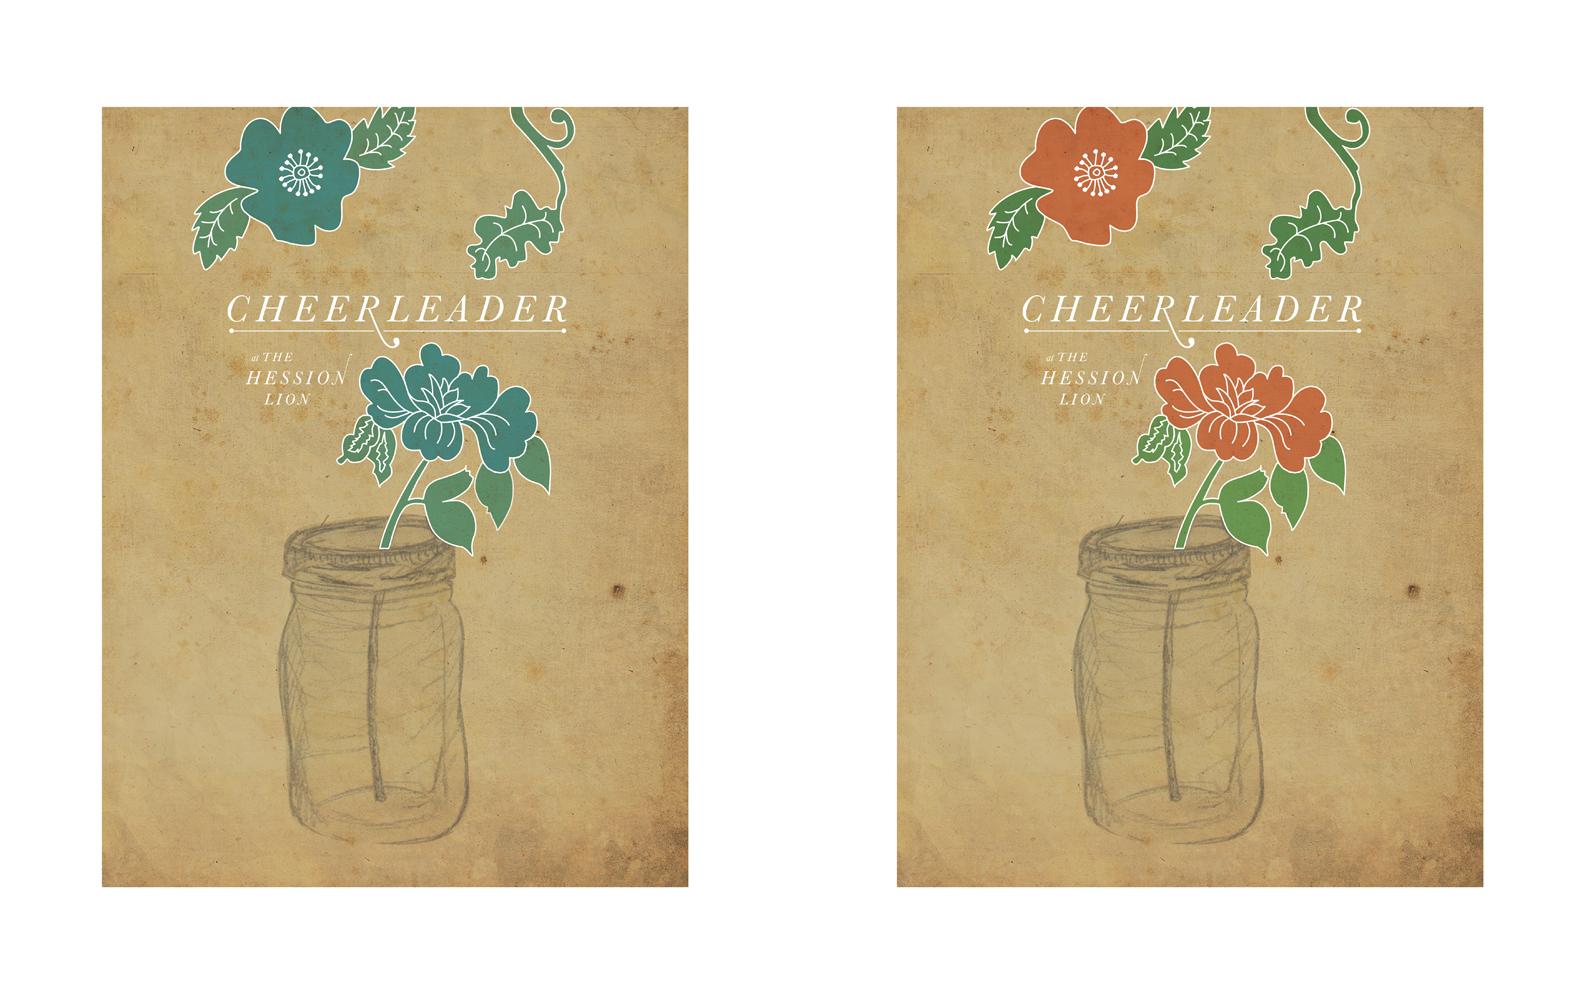 Cheerleader - image 2 - student project